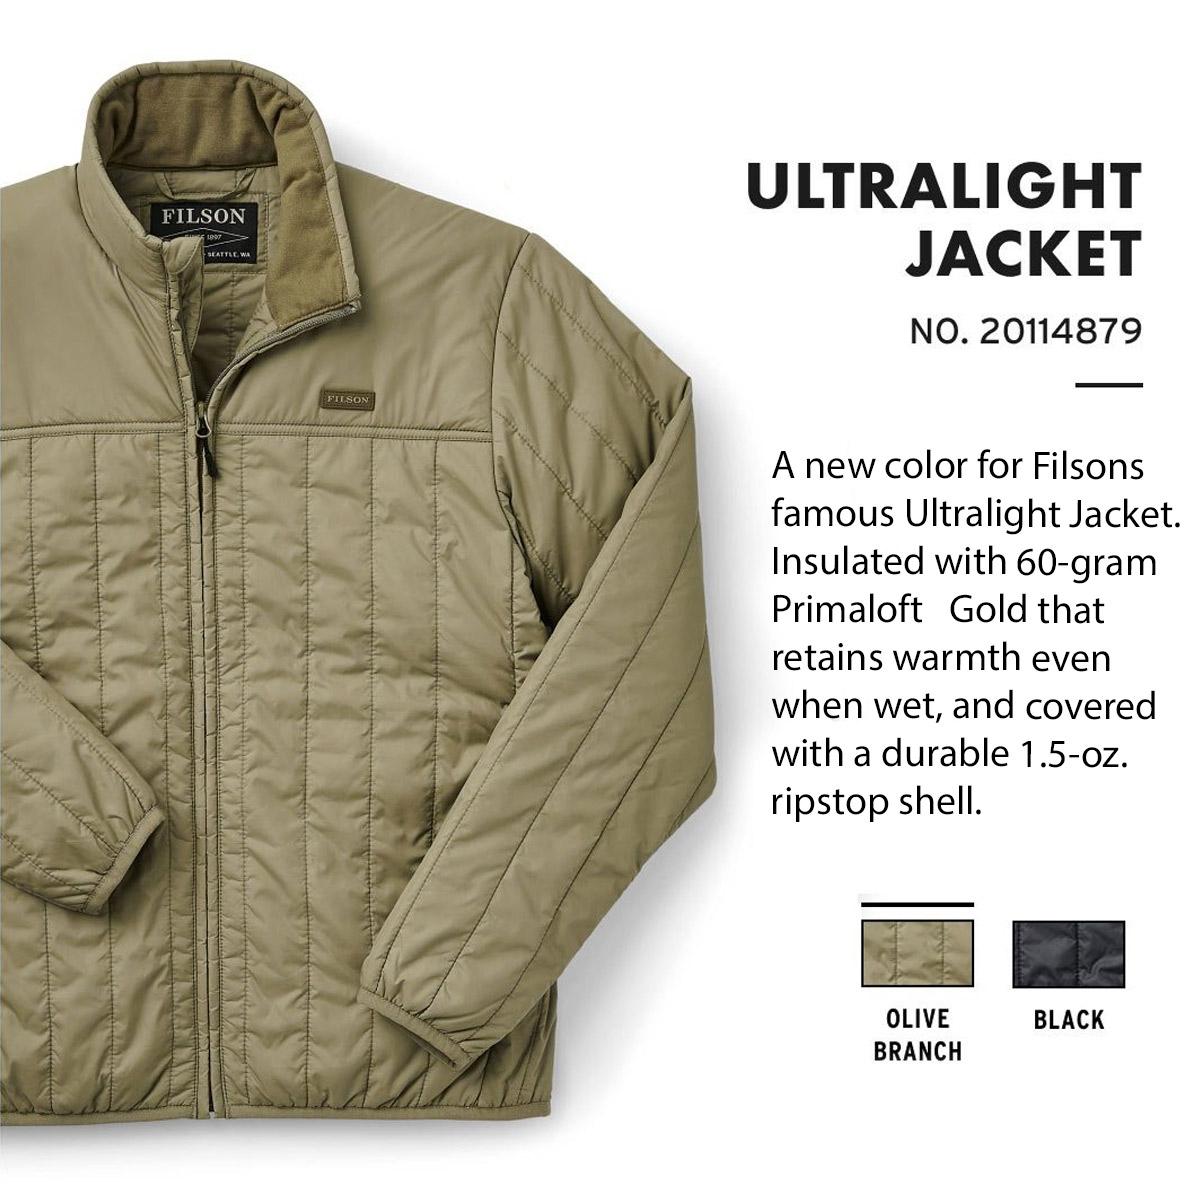 Filson Ultra Light Jacket Olive Branch, lichtgewicht jas met uitzonderlijke warmte-gewichtsverhouding